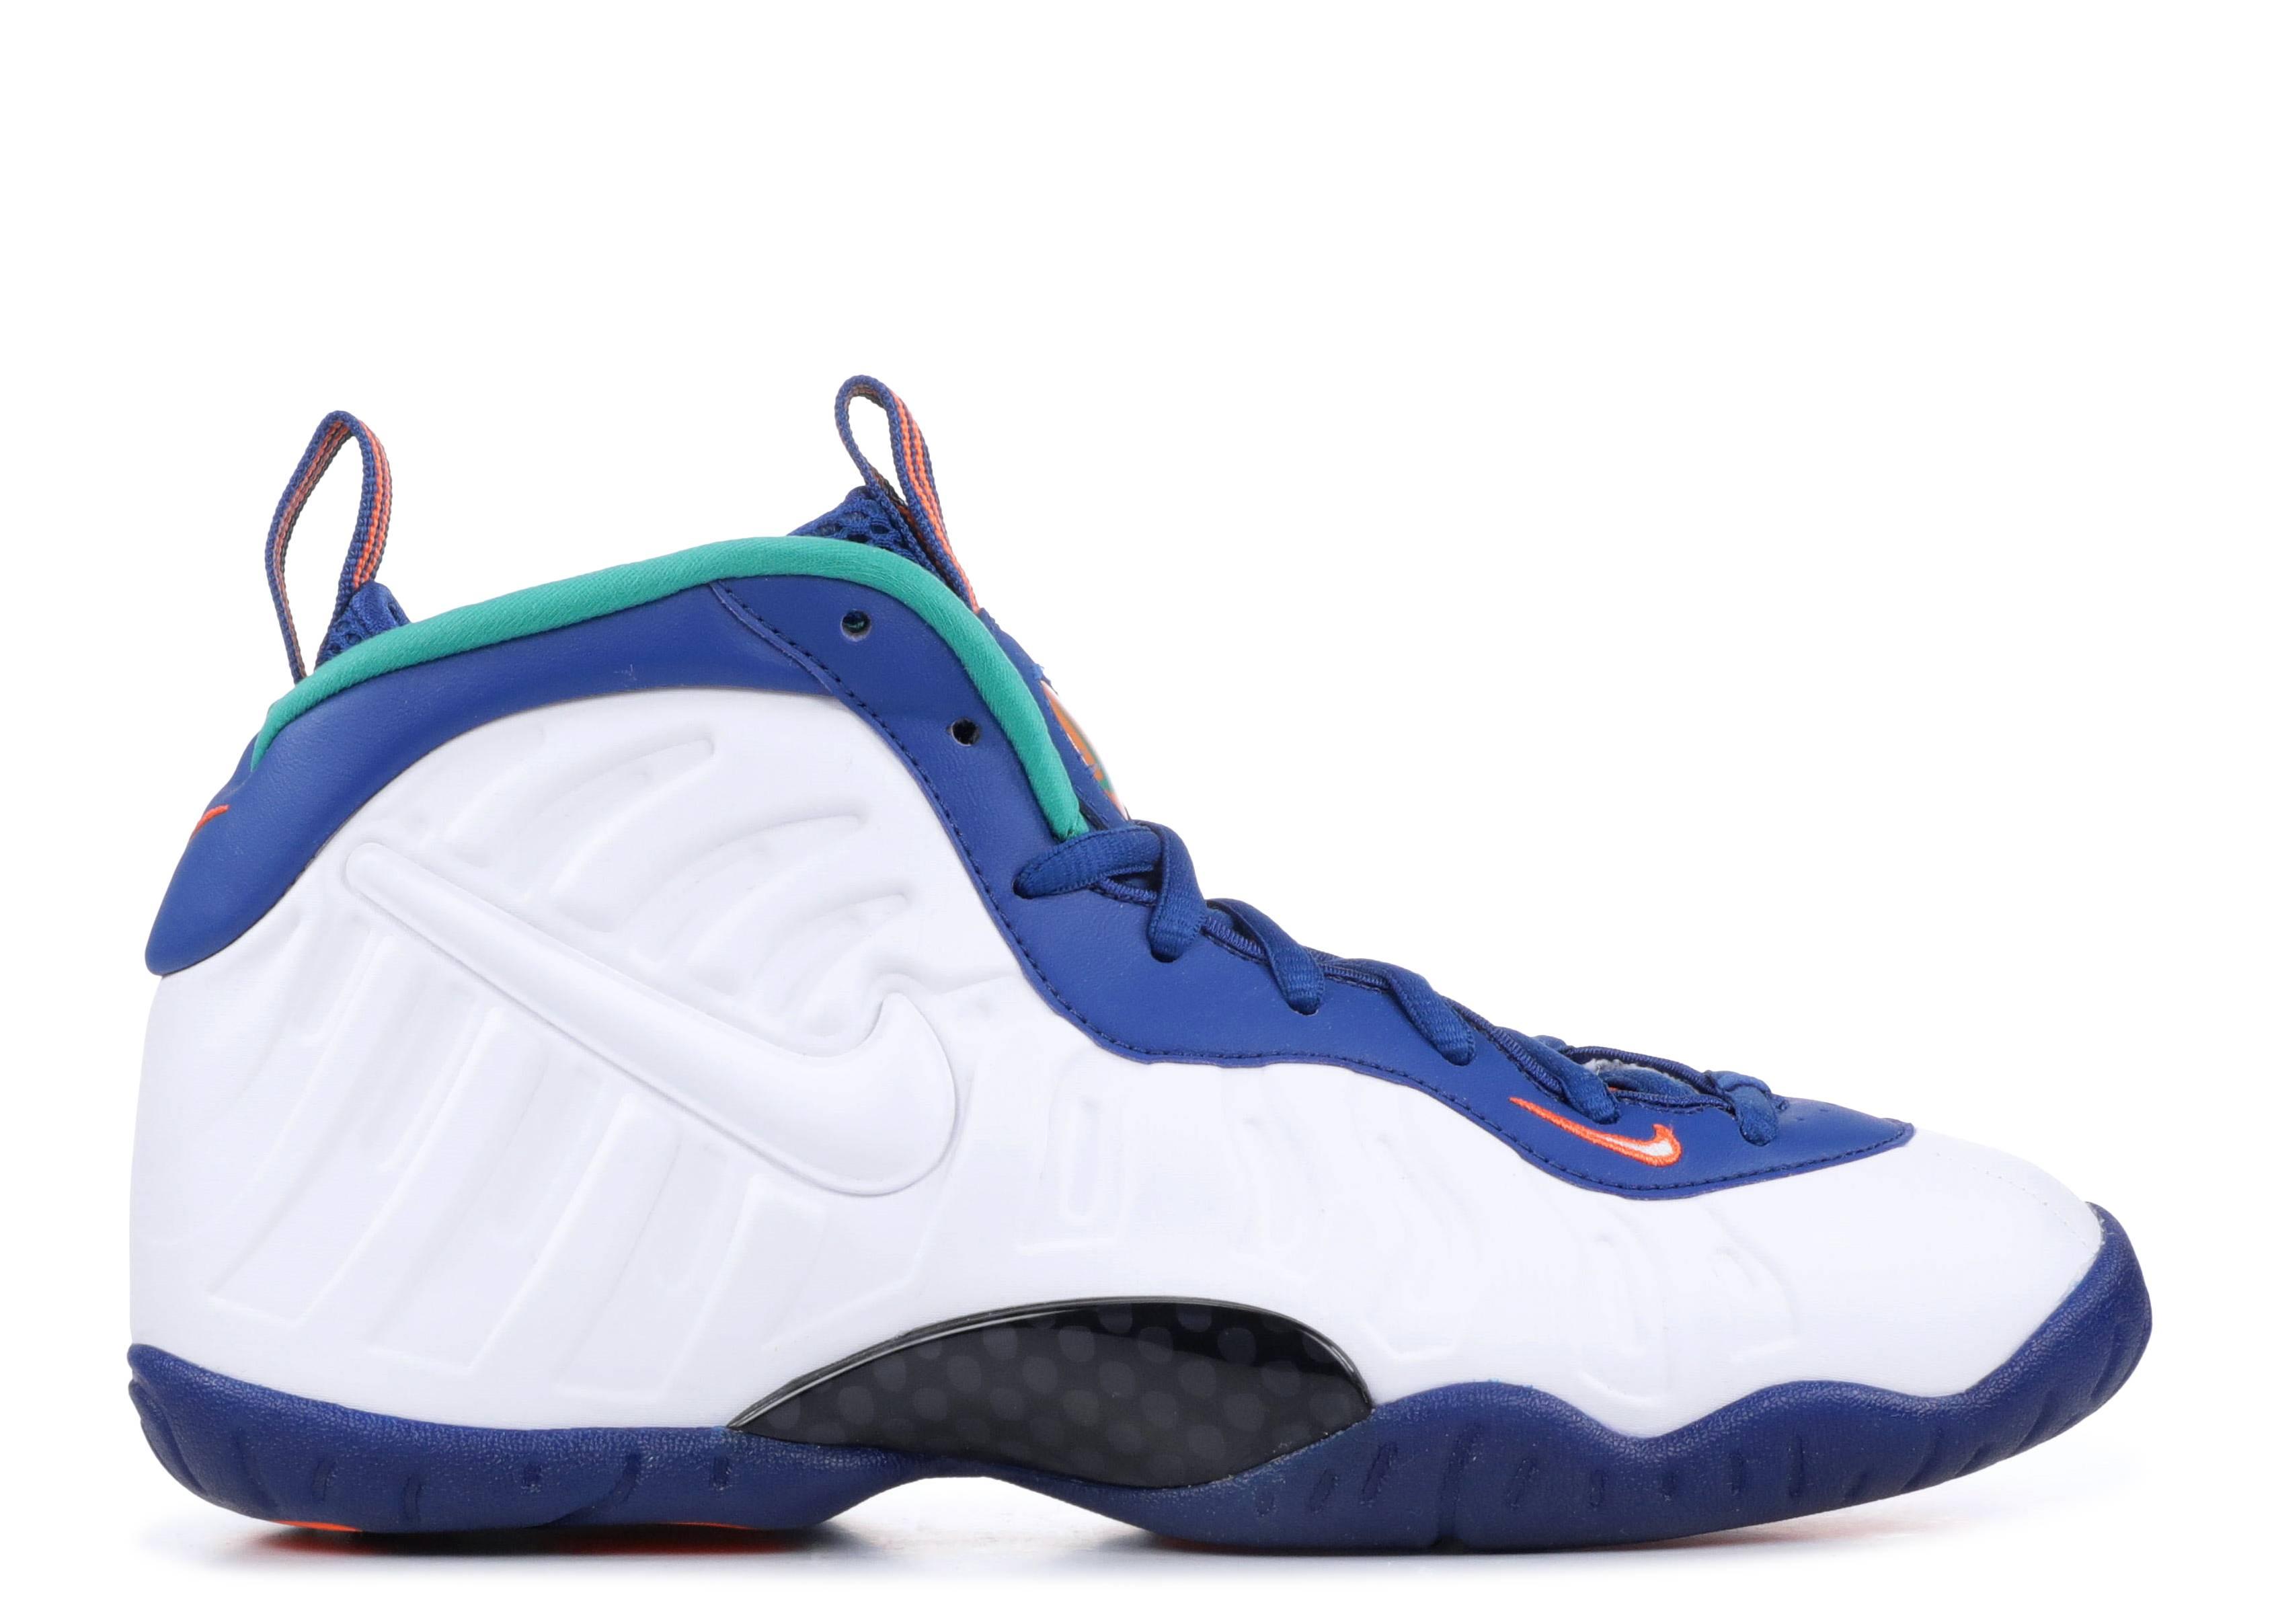 9fc699202f26 Nike Little Posite Pro (gs) - Nike - 644792 404 - gym blue white ...